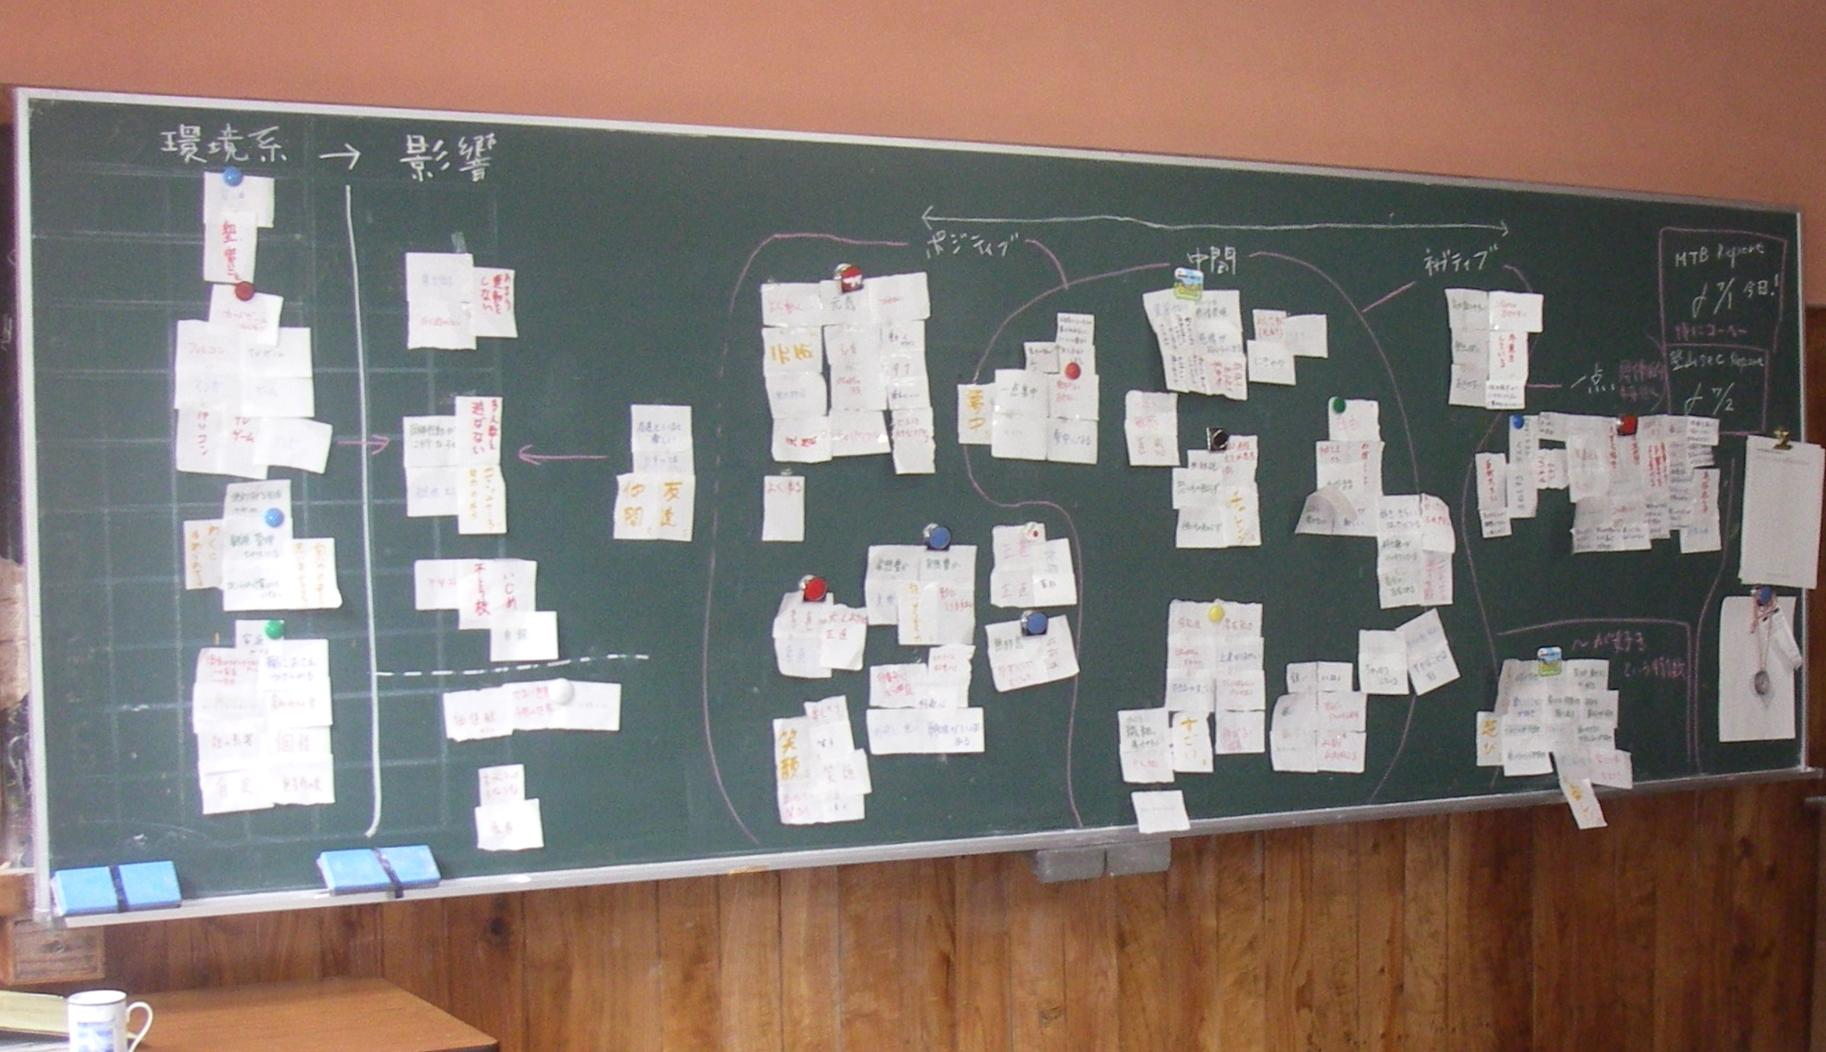 OBS-JALT2006-59日目:いよいよ卒業間近。1週間後の指導実習の準備開始!